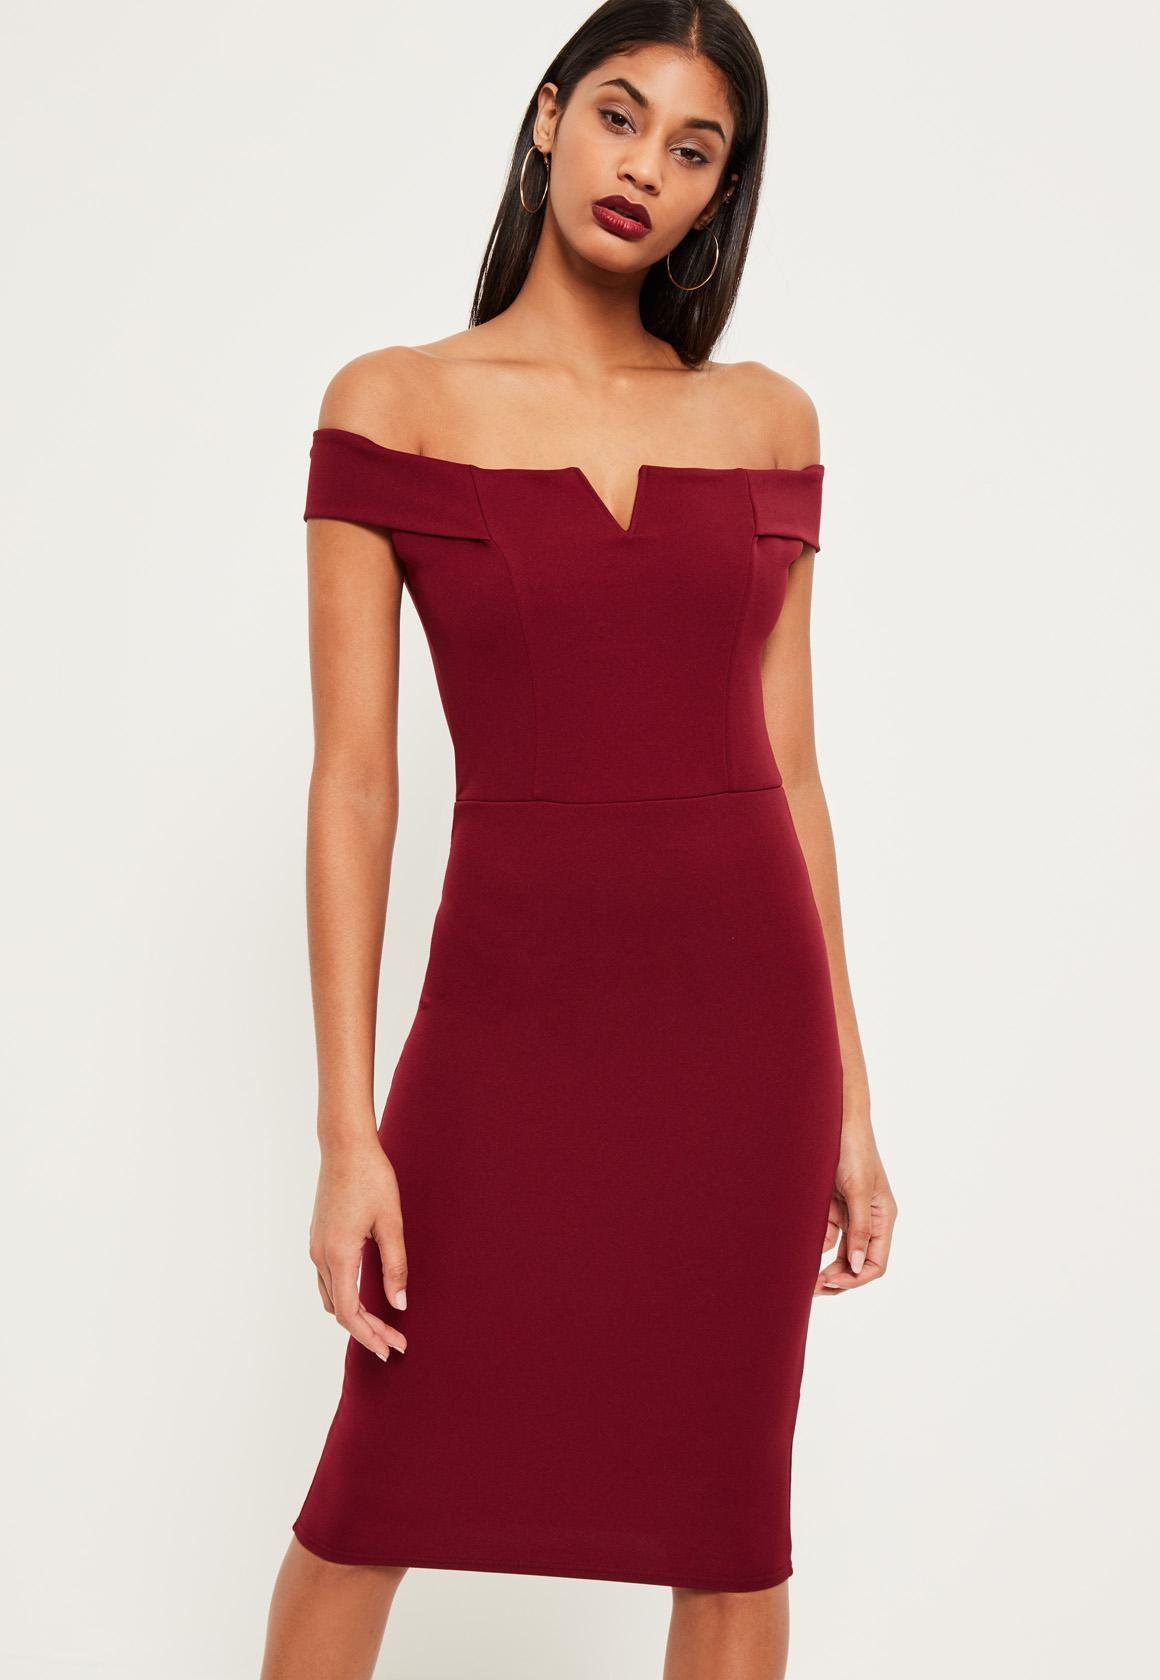 f3f159e82a0 Missguided - Burgundy V Front Bardot Midi Dress | Let's get fancy ...